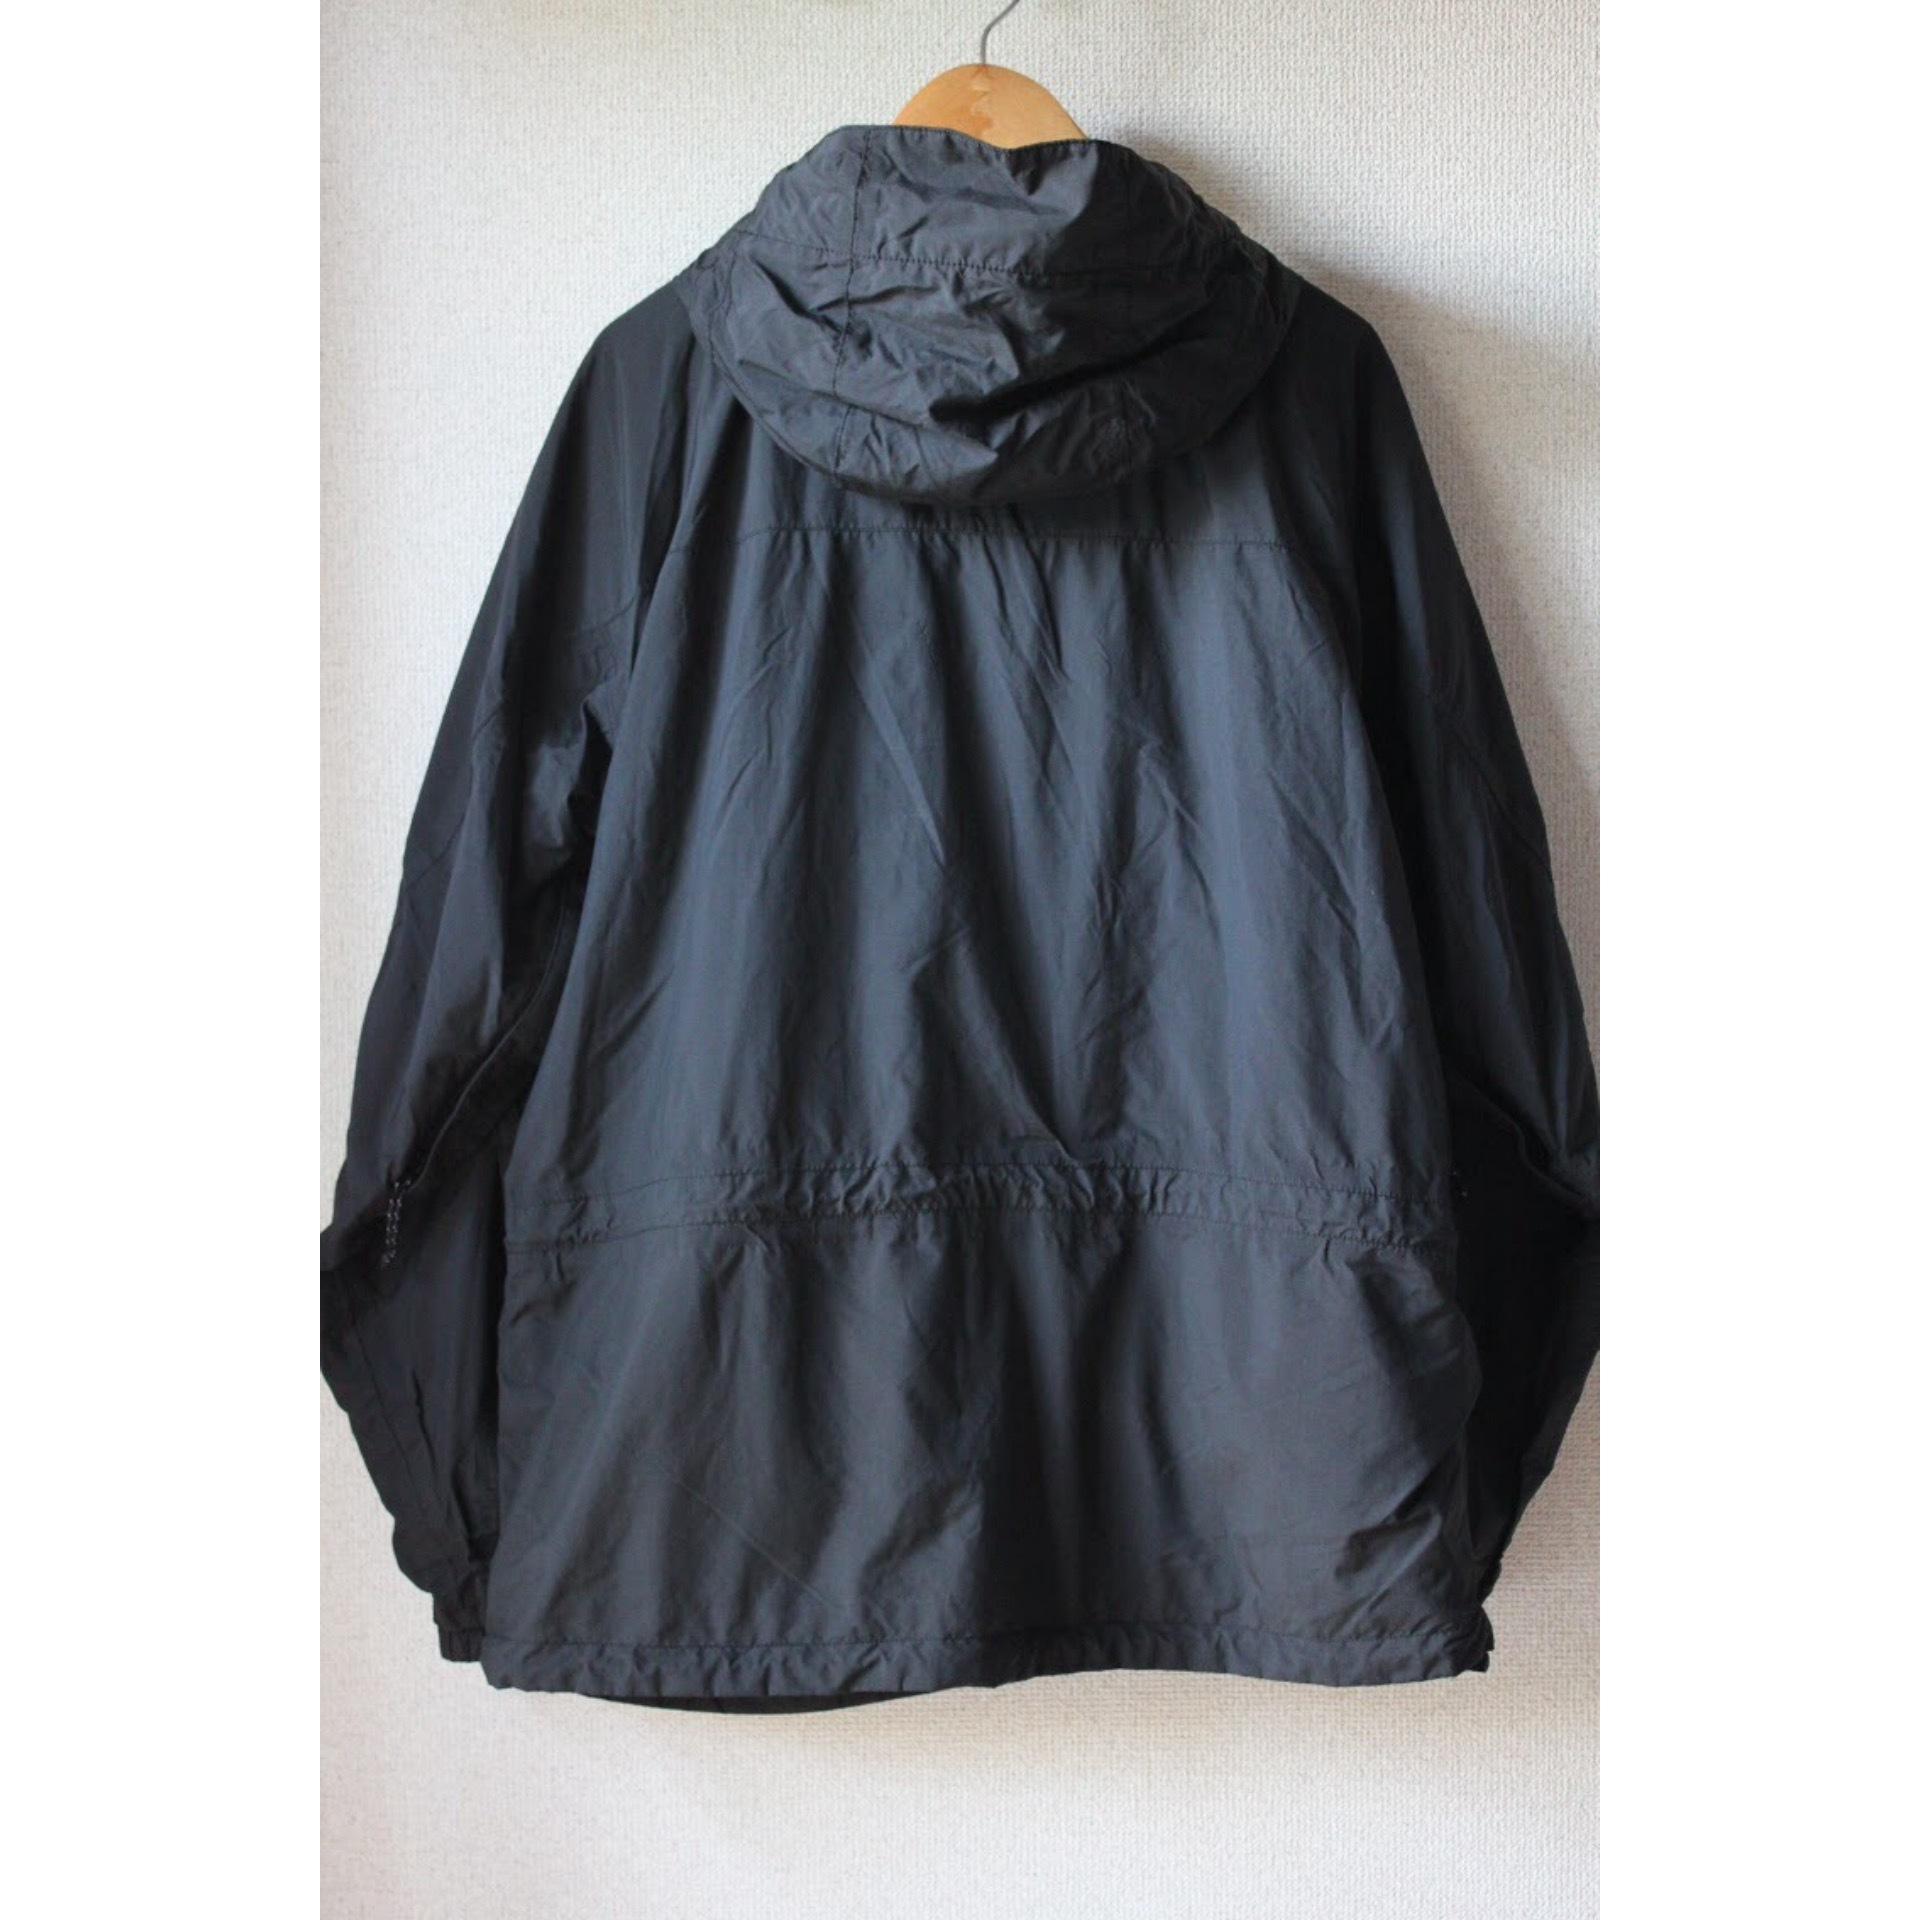 Vintage mountain jacket by RLX